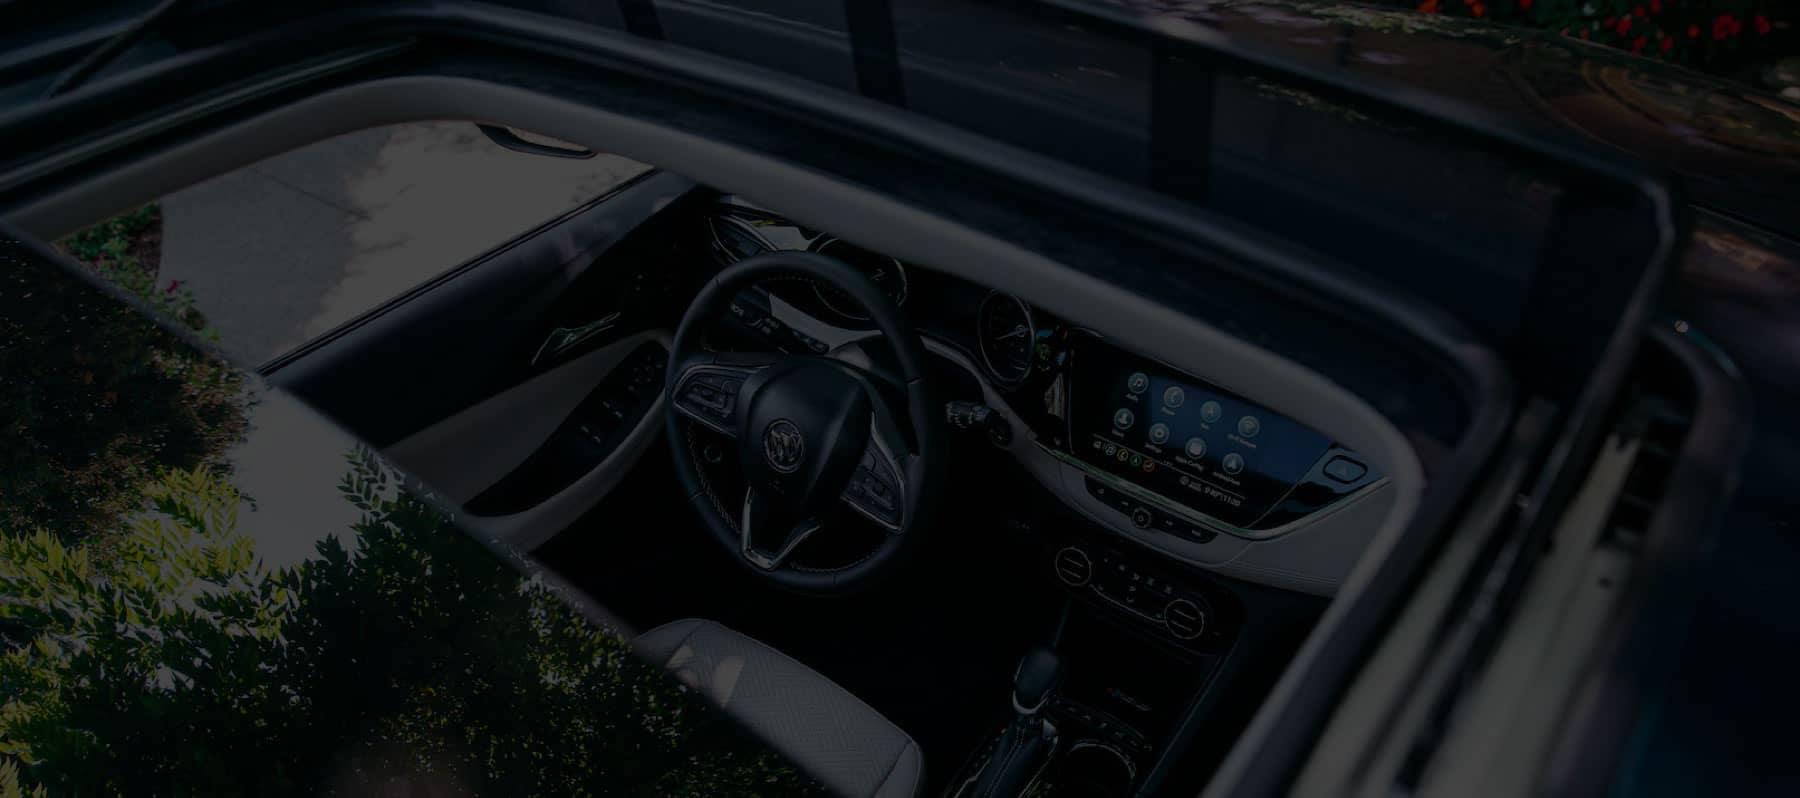 Buick interior as seen through the moonroof